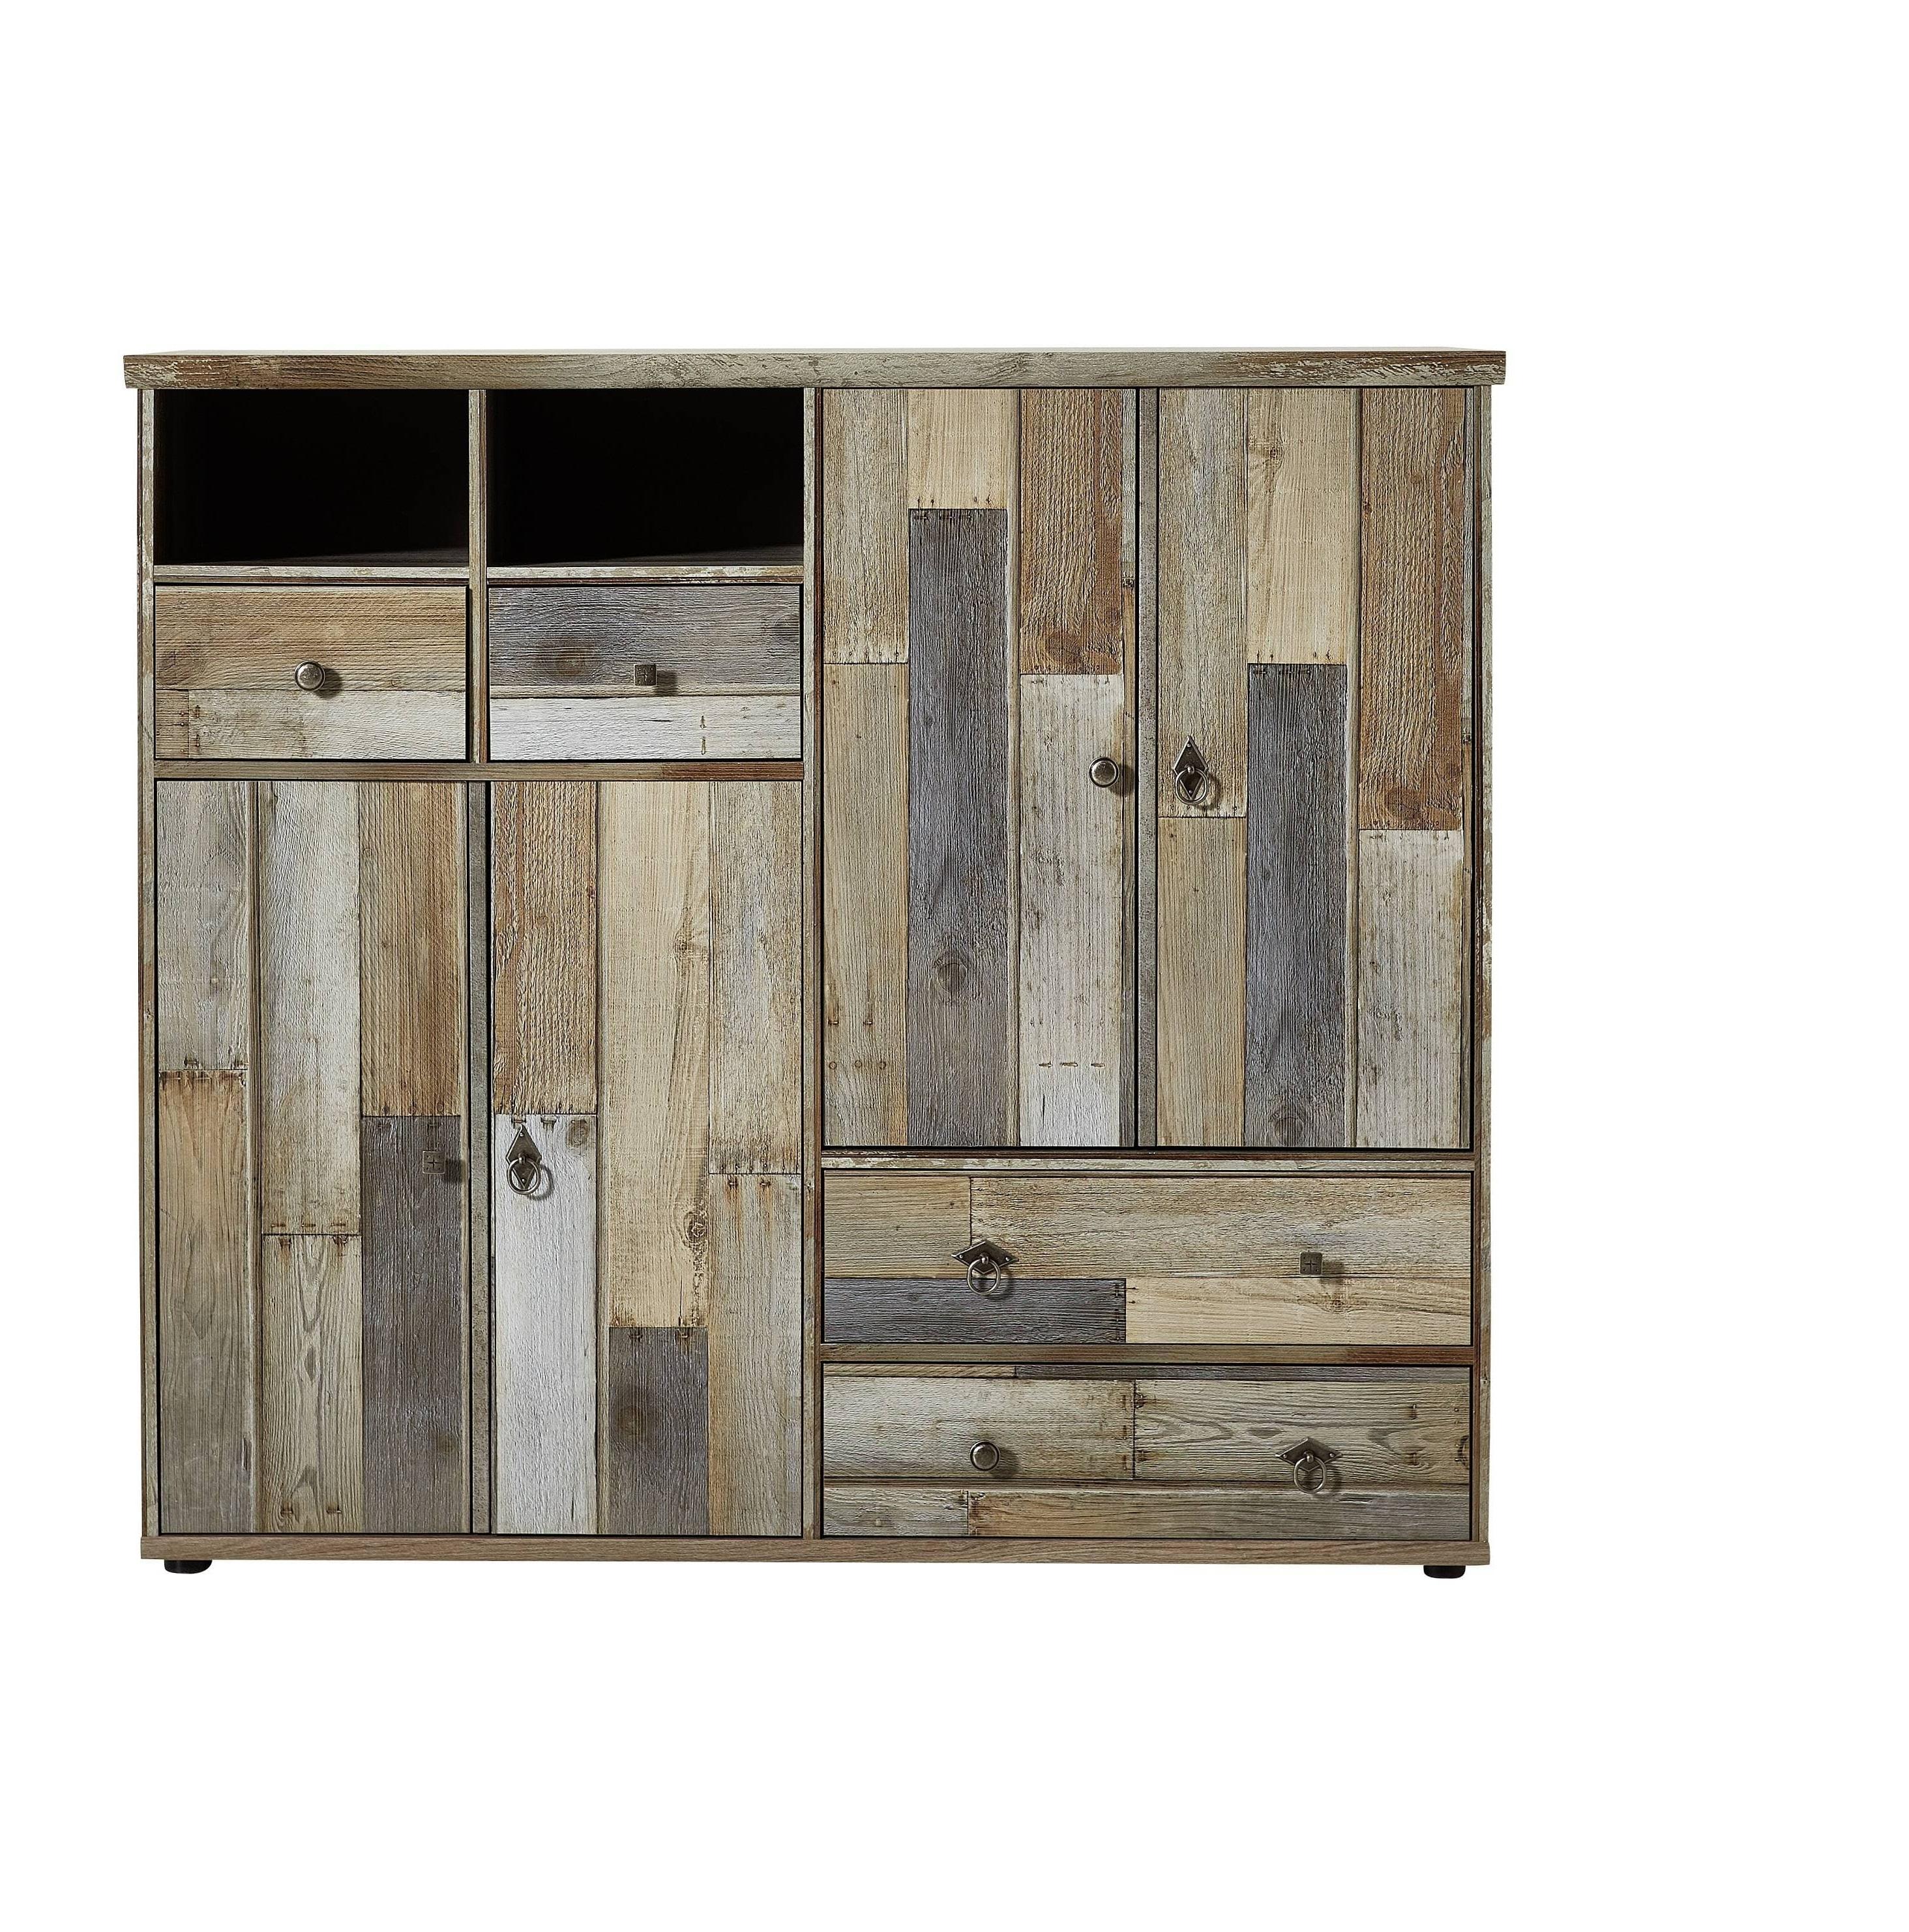 Cabinet hol din pal, cu 4 usi si 4 sertare Bazna Large Natur / Gri inchis, l130xA40xH117 cm somproduct.ro